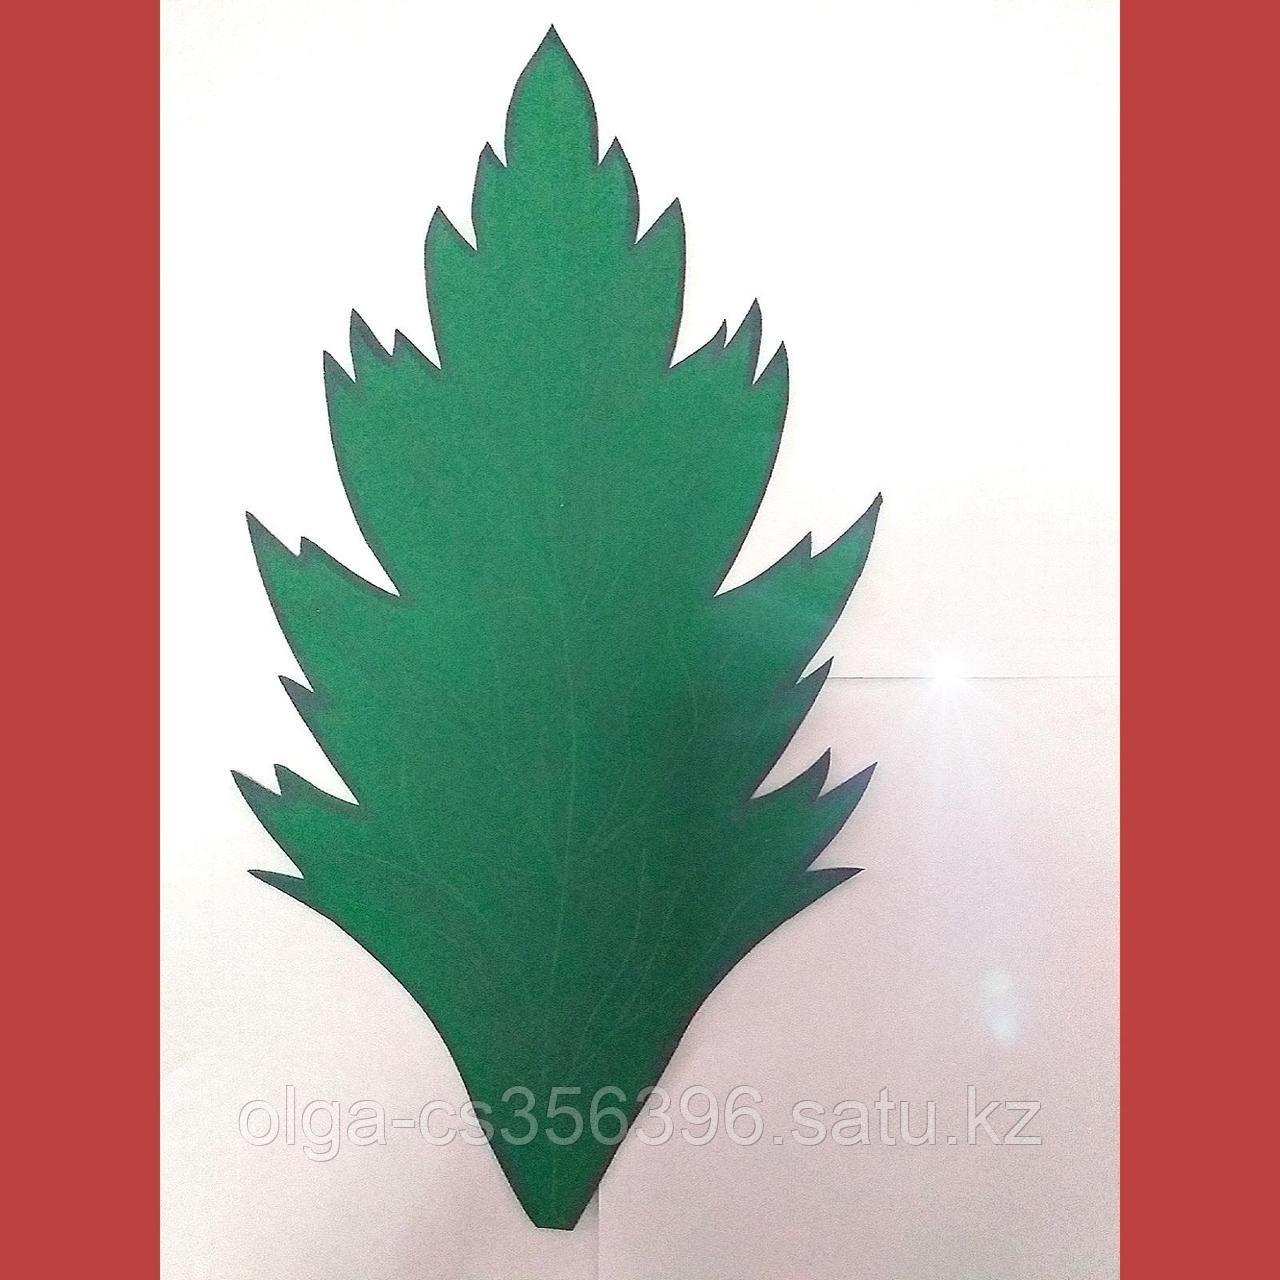 Лист из фоамирана. Размер: 45 * 25 см. Creativ 2735